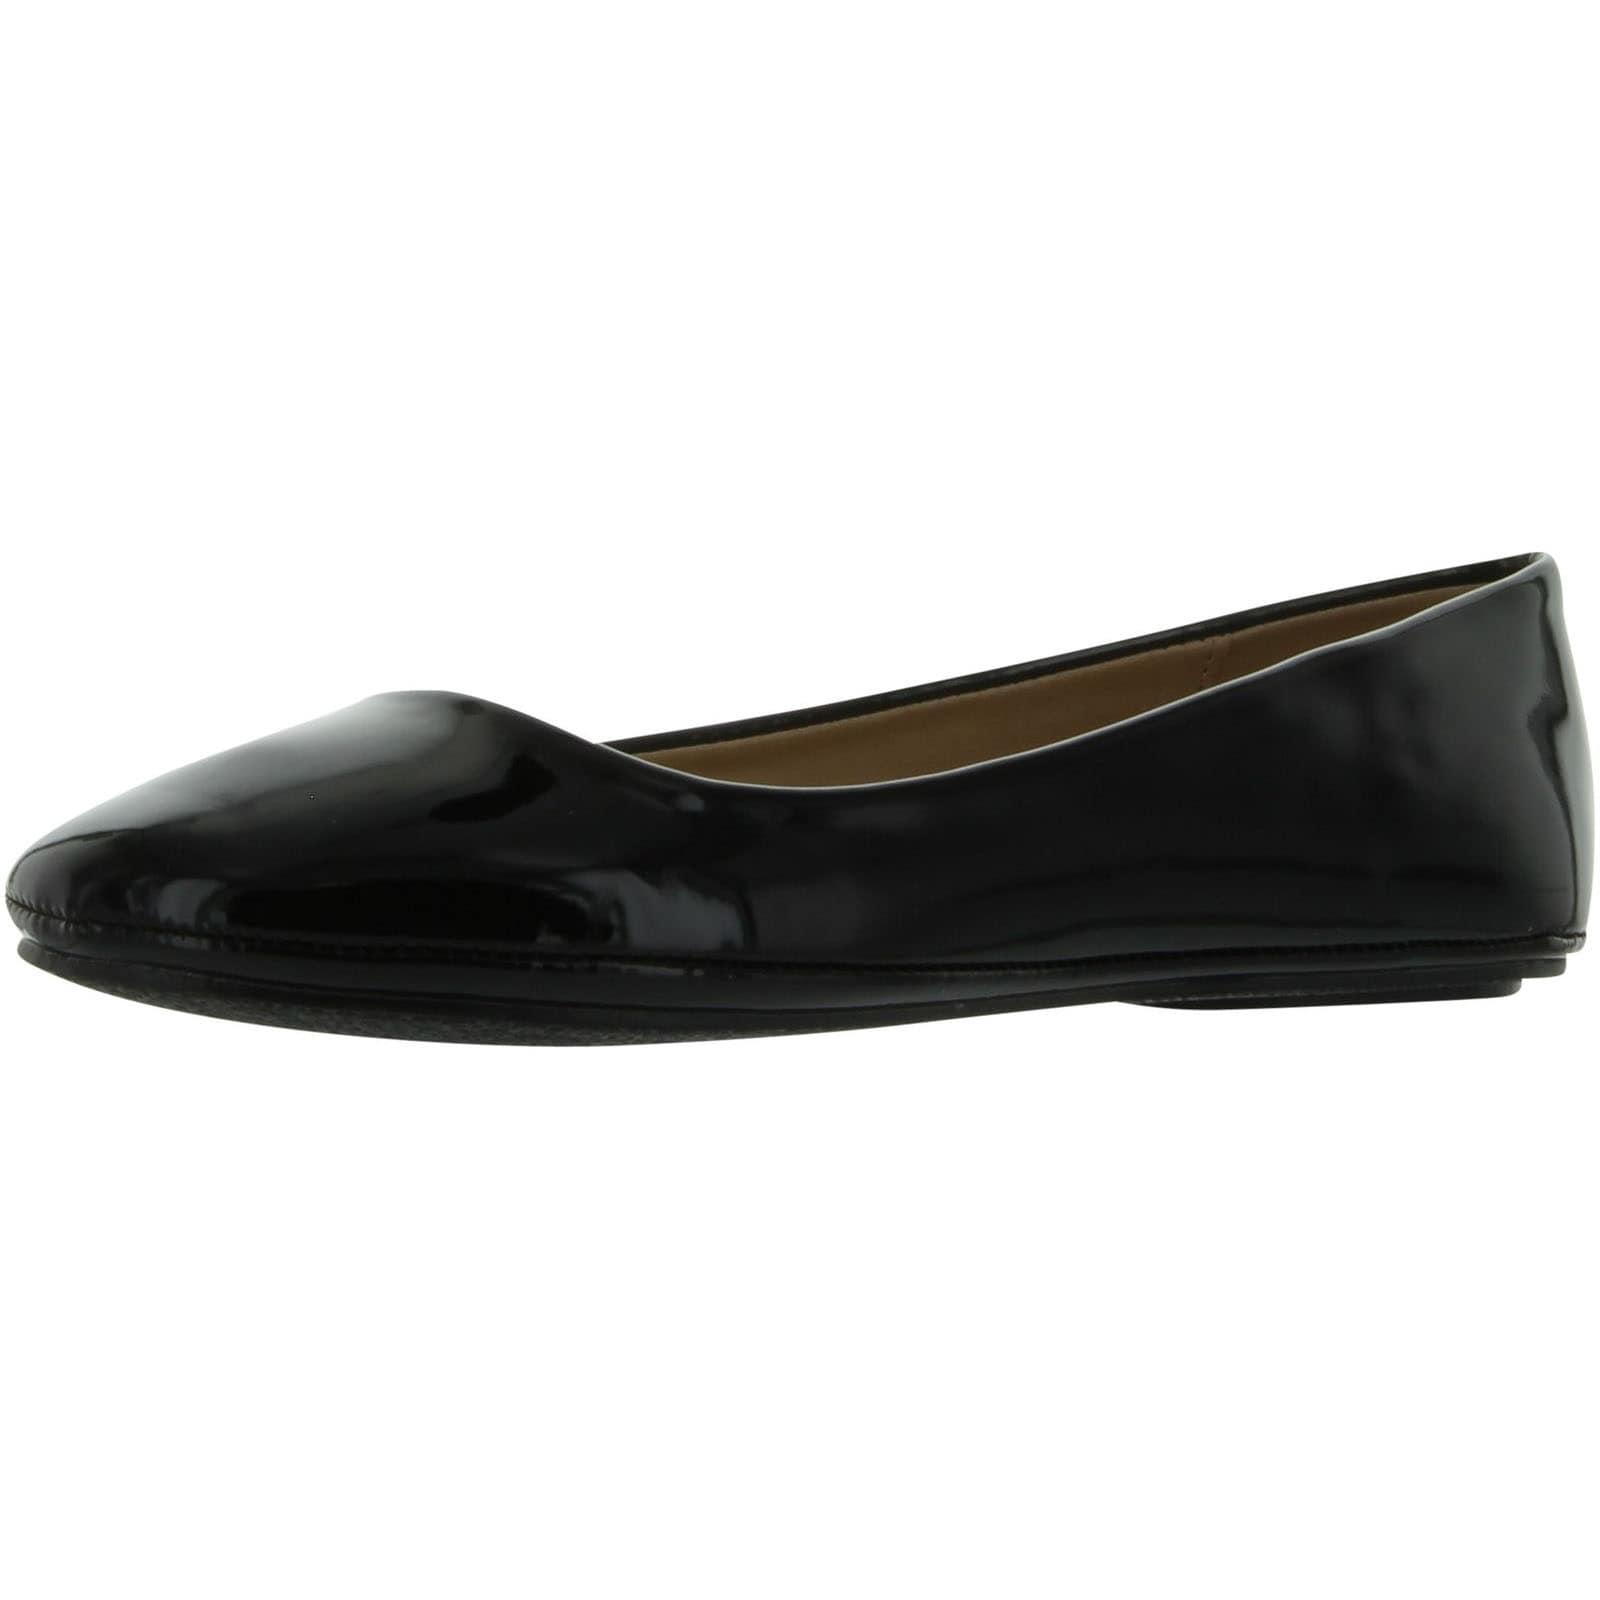 016df3cc1e89 Soda Women s Shoes